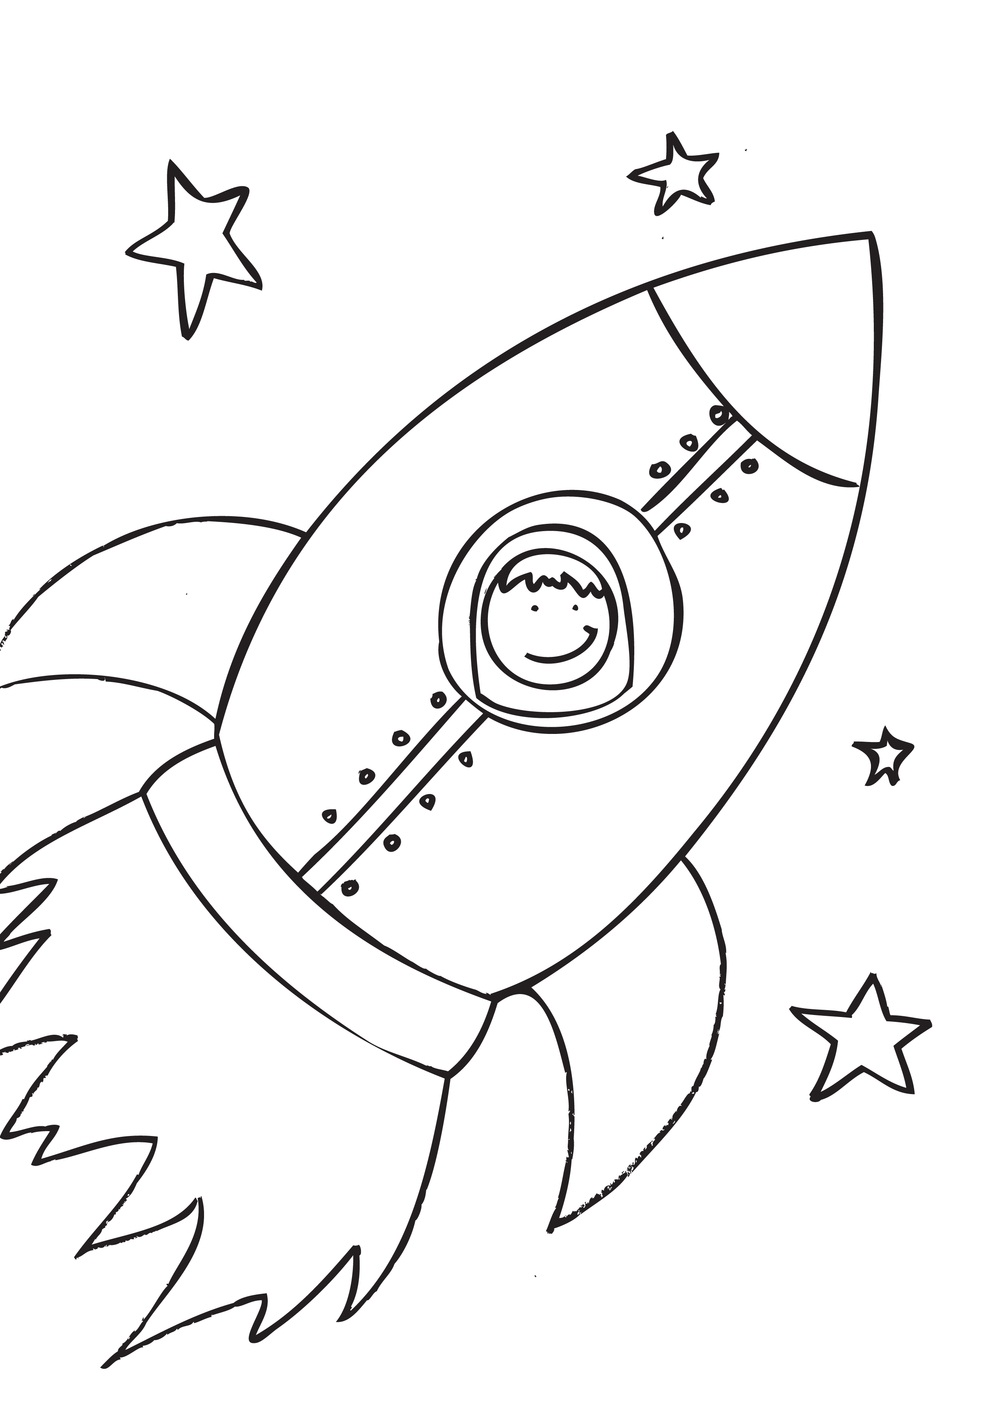 Free Printable Rocket Ship Coloring